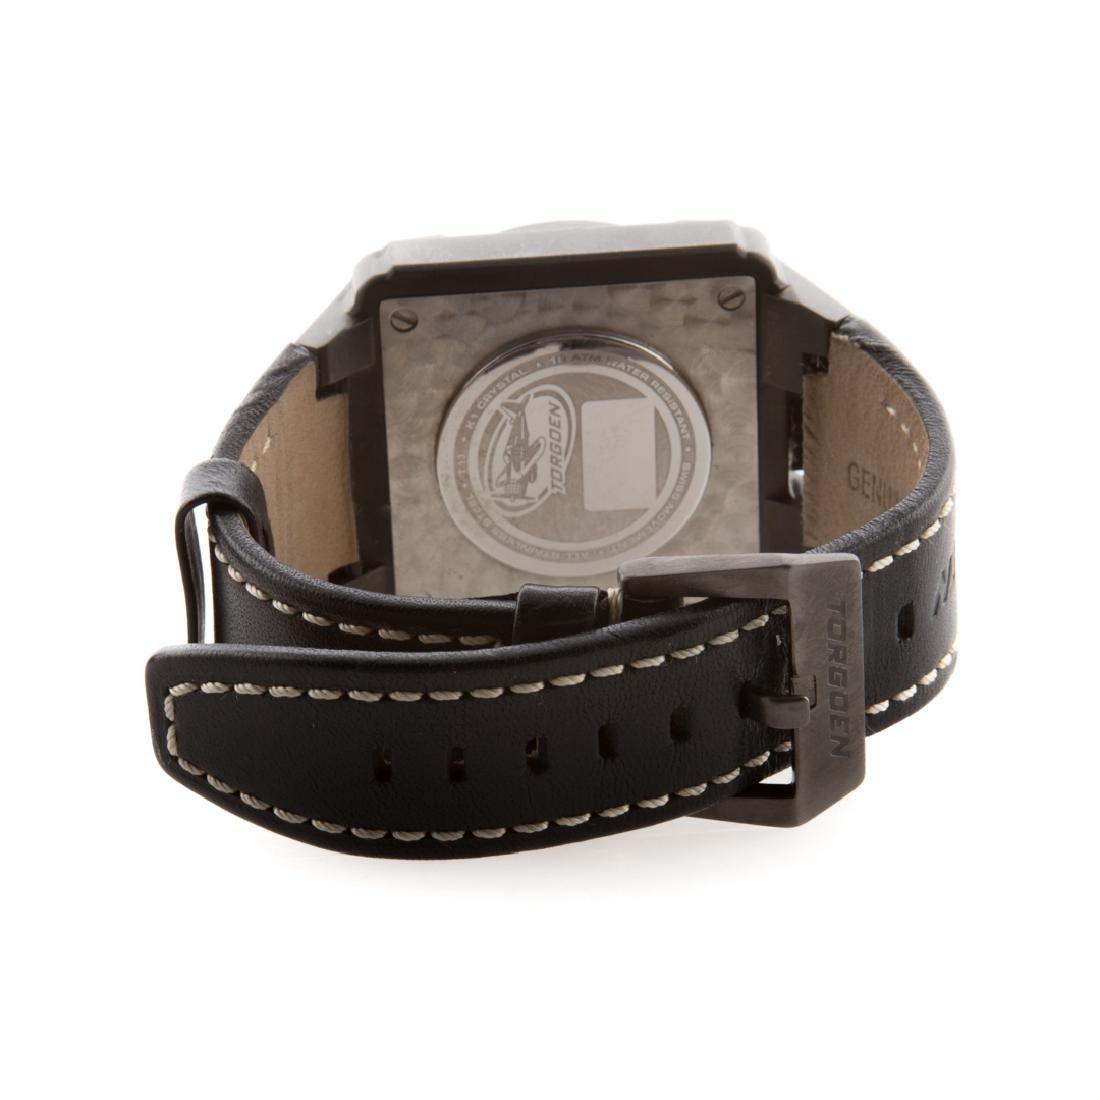 A Gentlemen's Swiss Torgoen Watch - 3